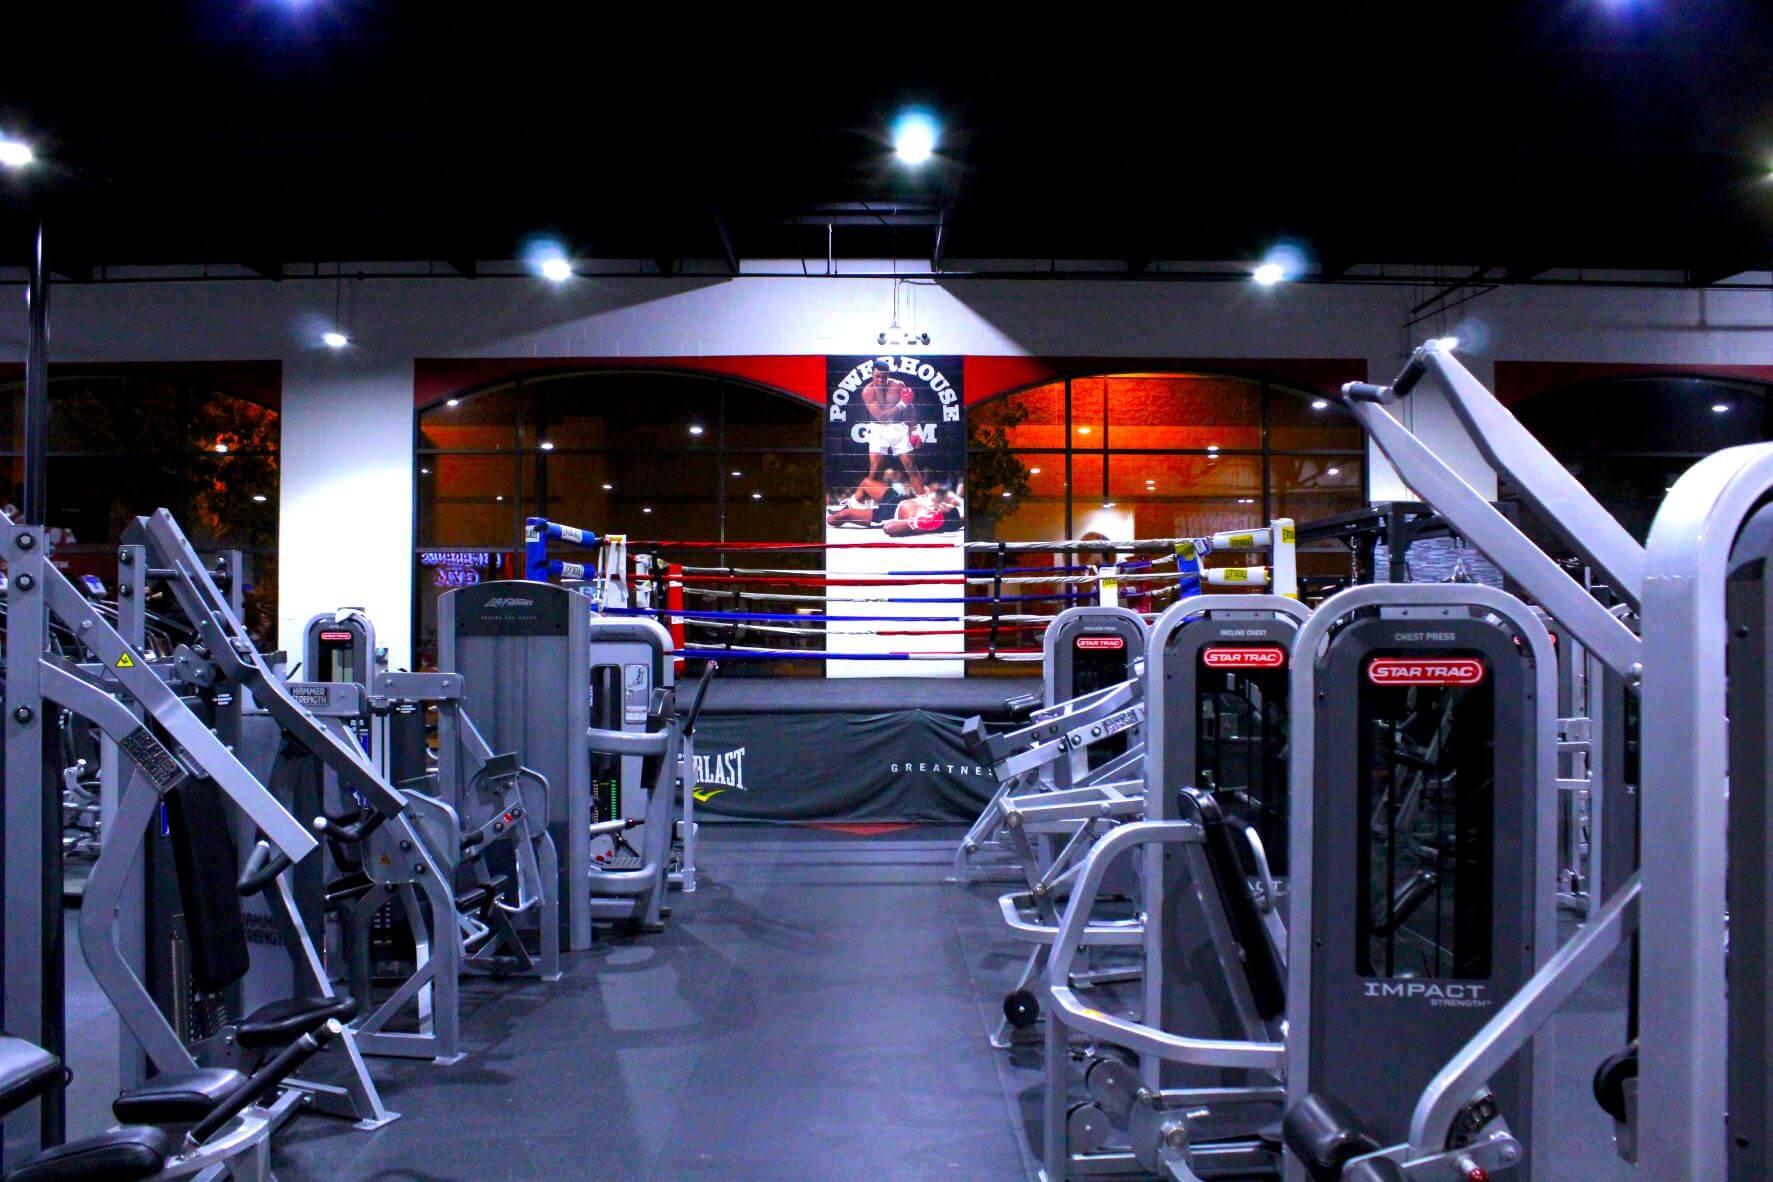 An Image of the Murrieta, CA Powerhouse Gym Location